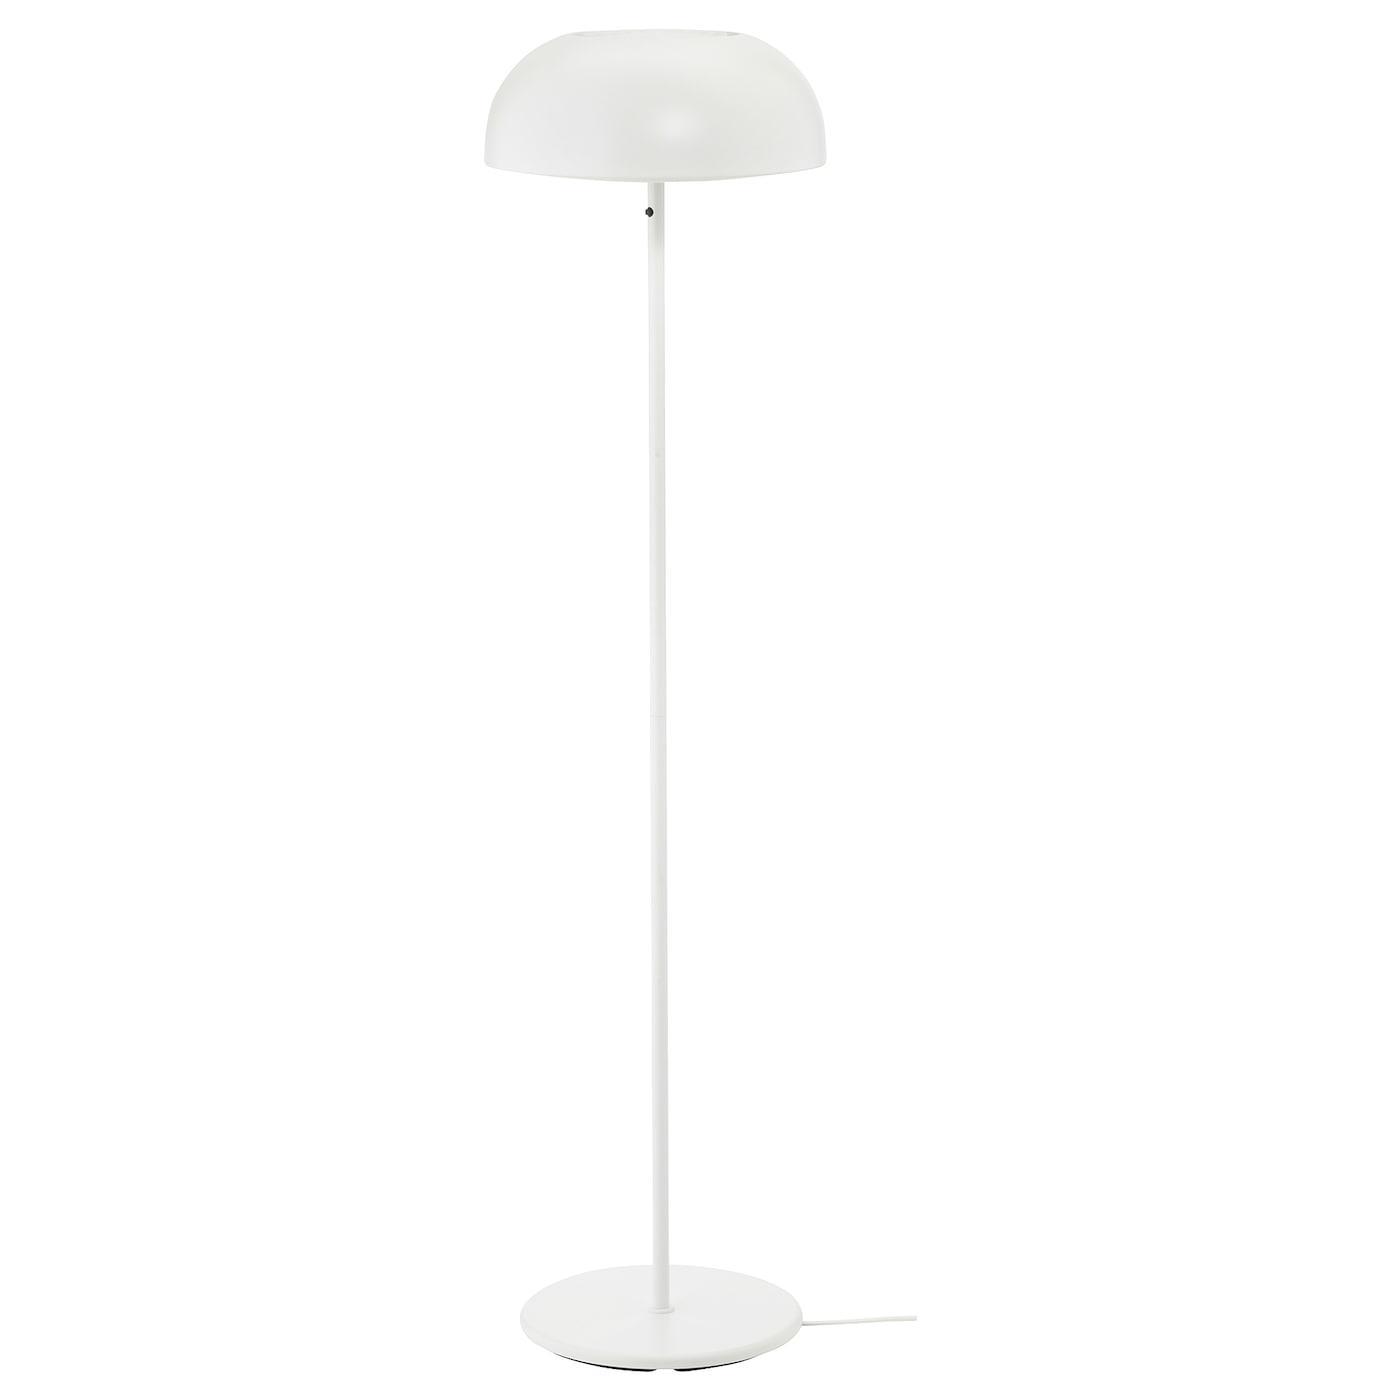 Stehlampe Grau Ikea